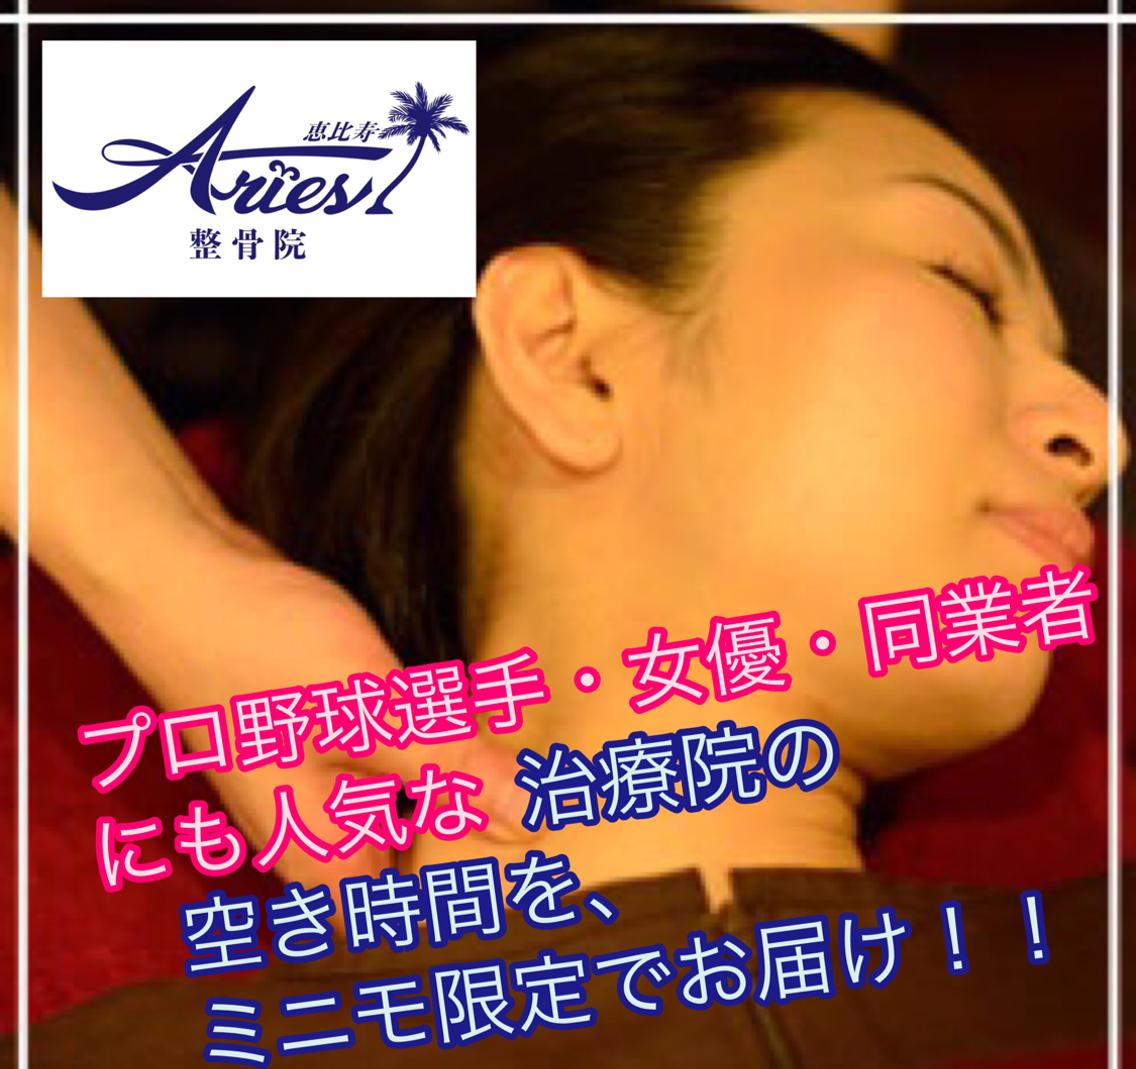 Aries恵比寿所属・斎藤 弘明の掲載